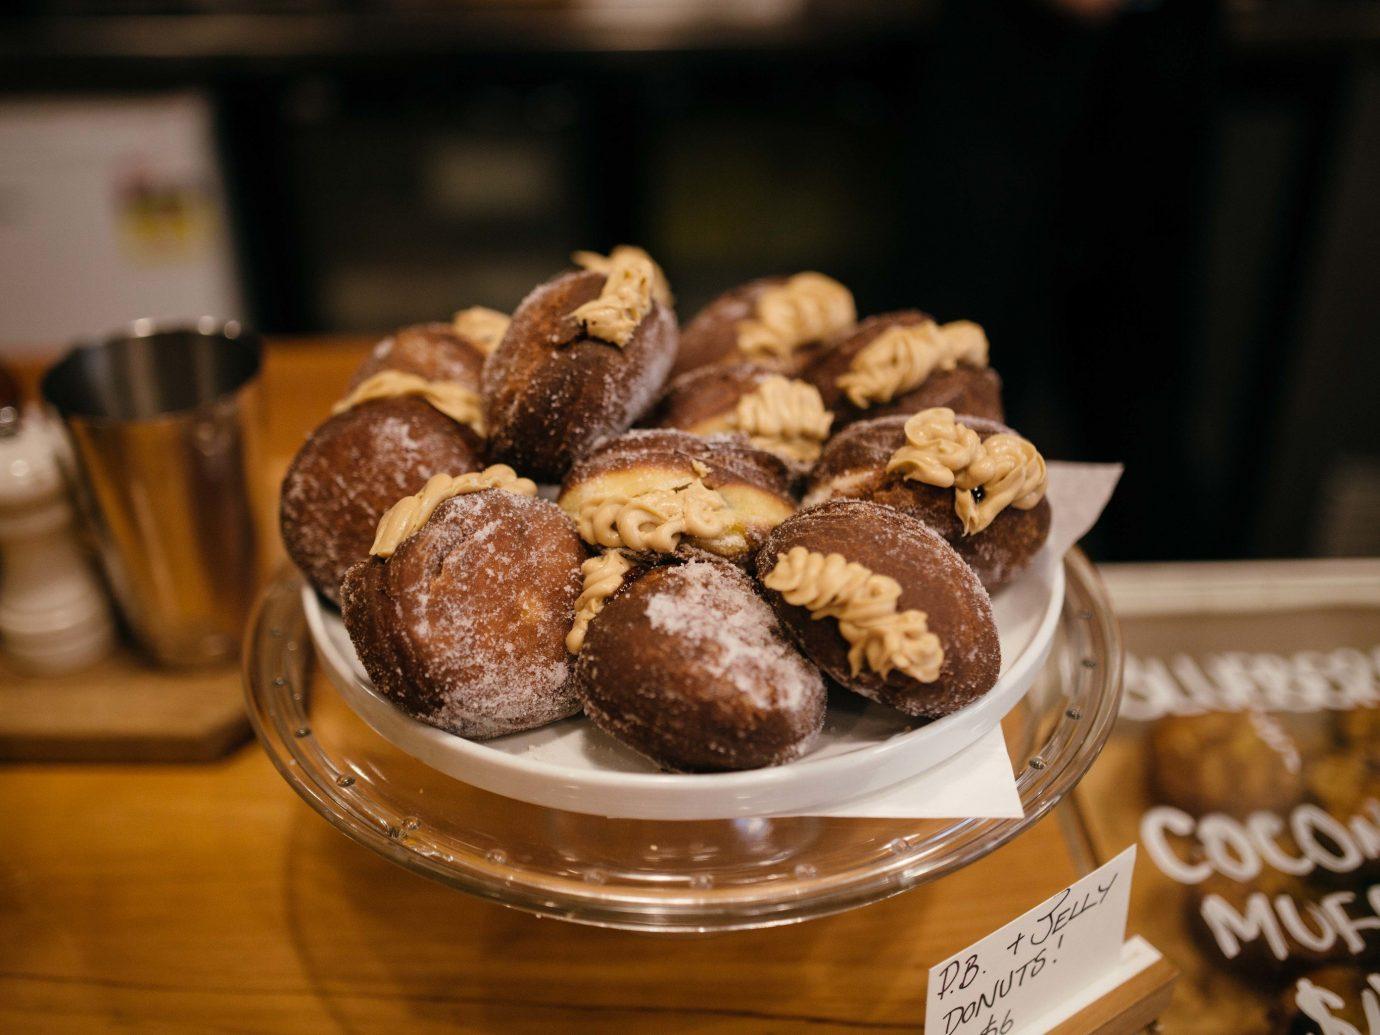 Food + Drink Offbeat Travel Trends table indoor food plate dessert snack finger food brunch flavor bakery baking